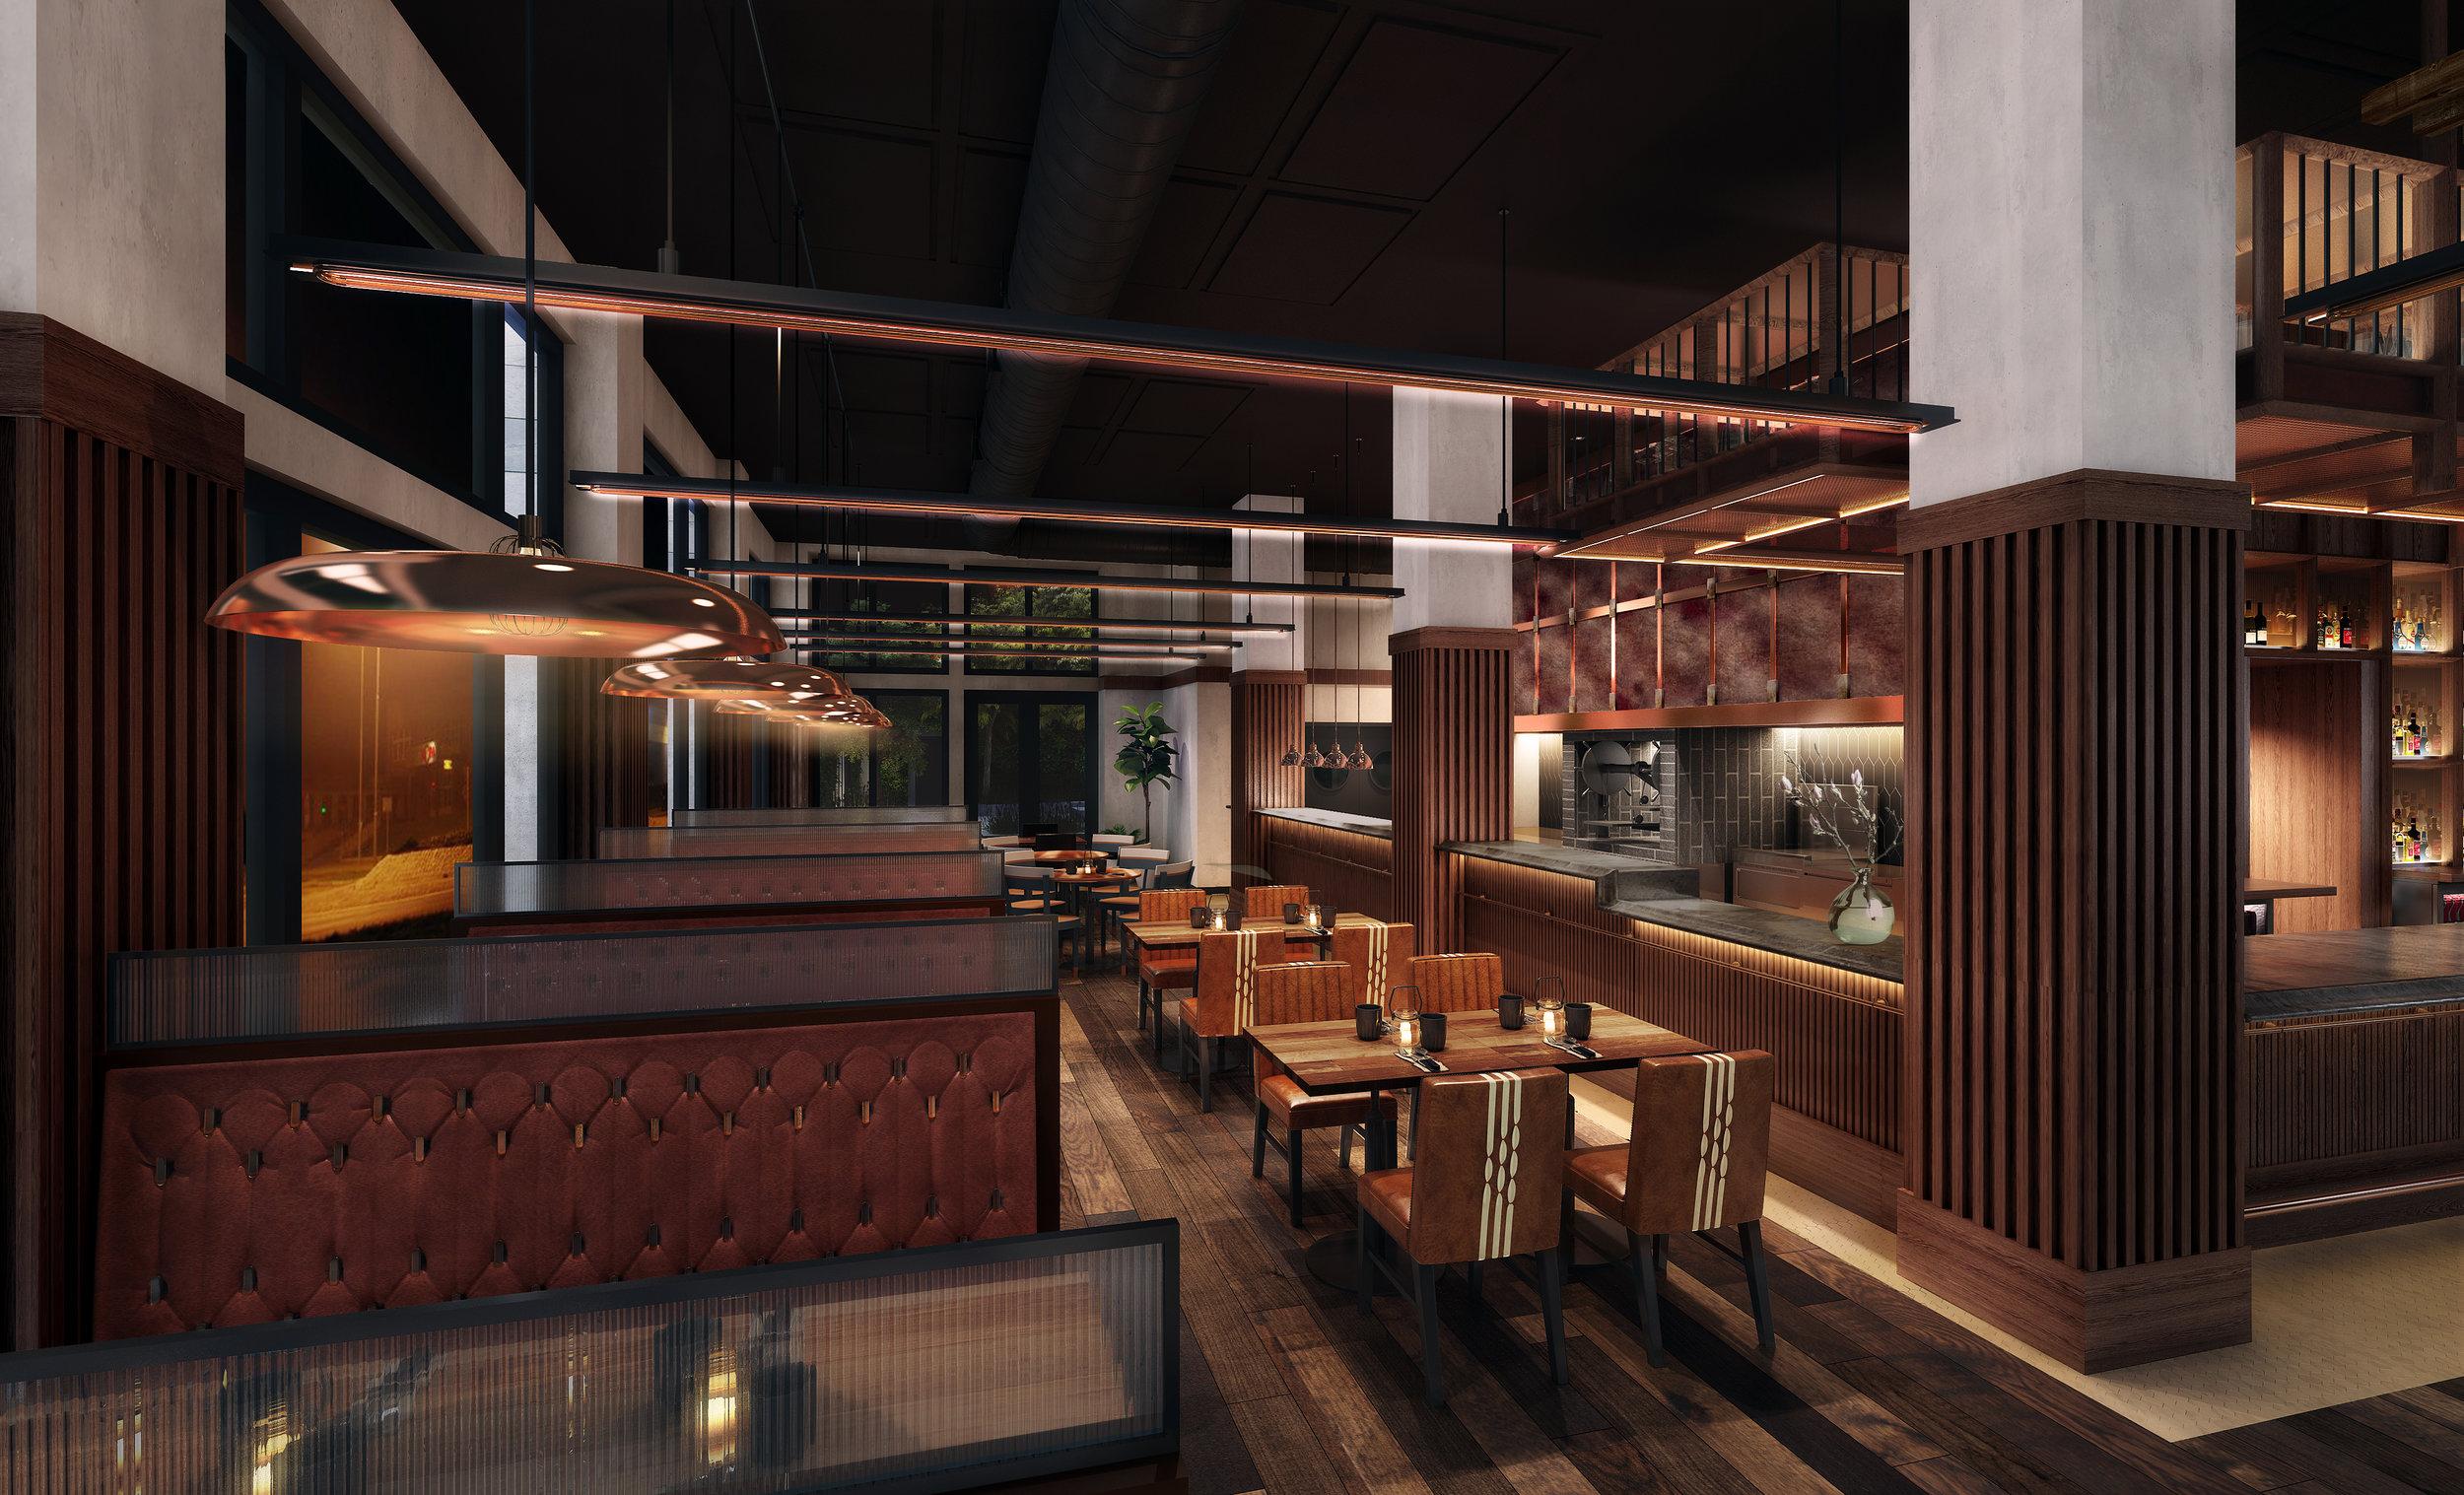 Des Moines Hotel Restaurant